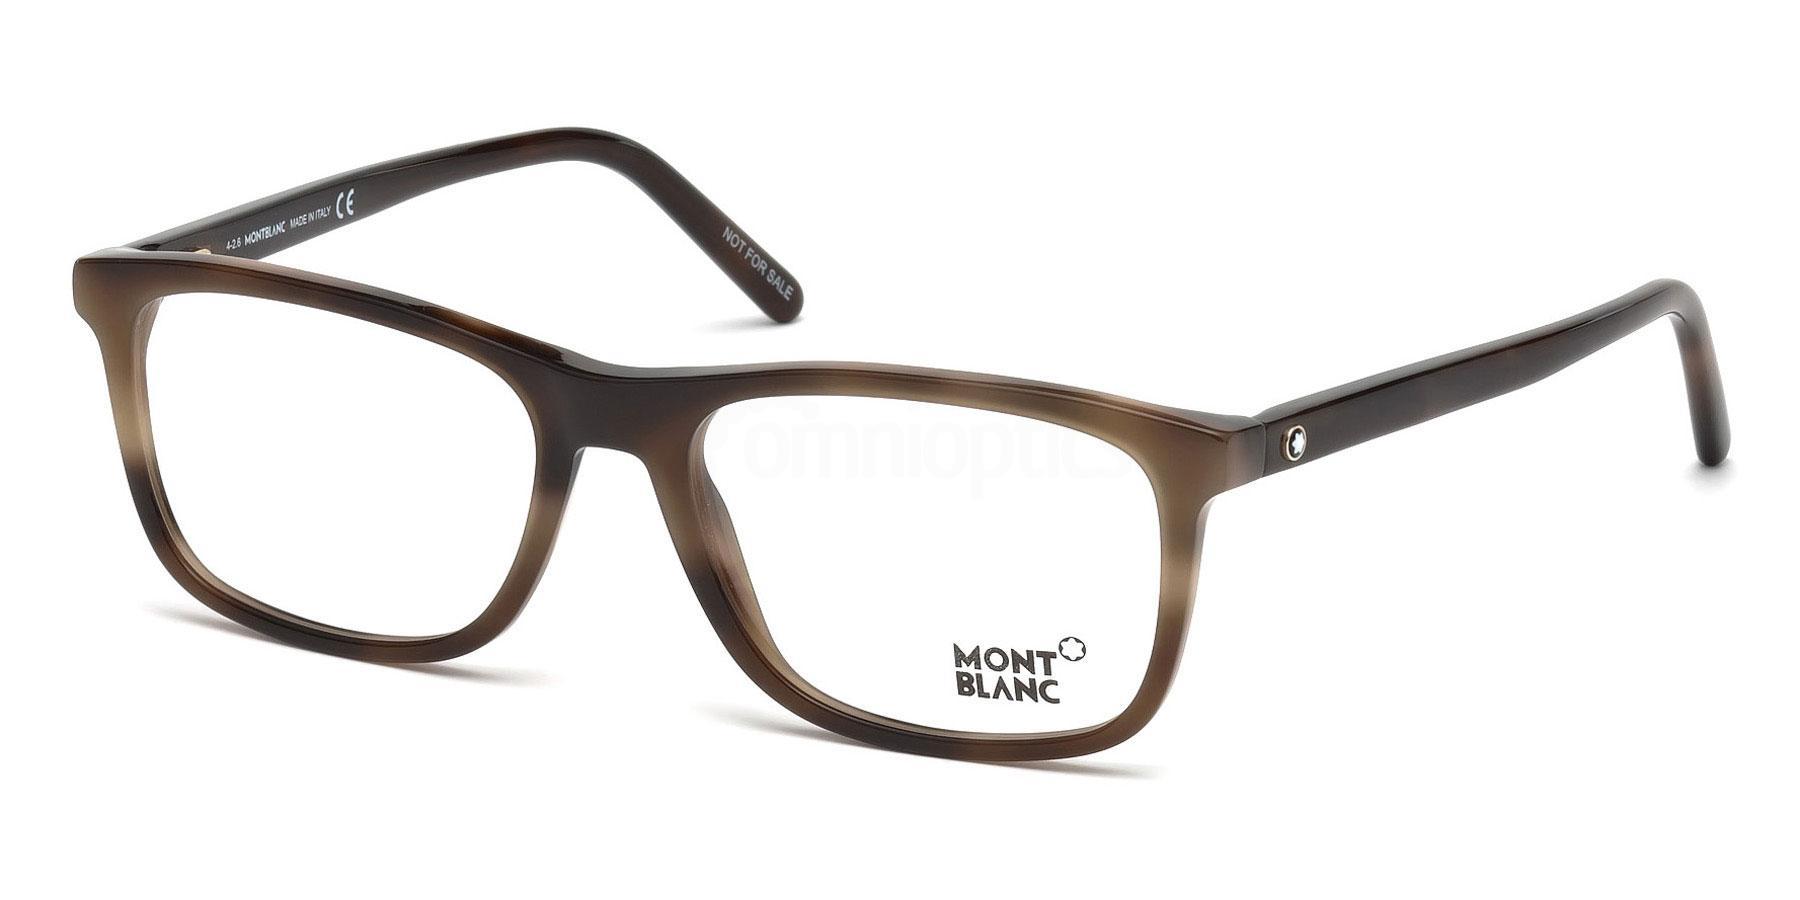 052 MB0672 Glasses, Mont Blanc